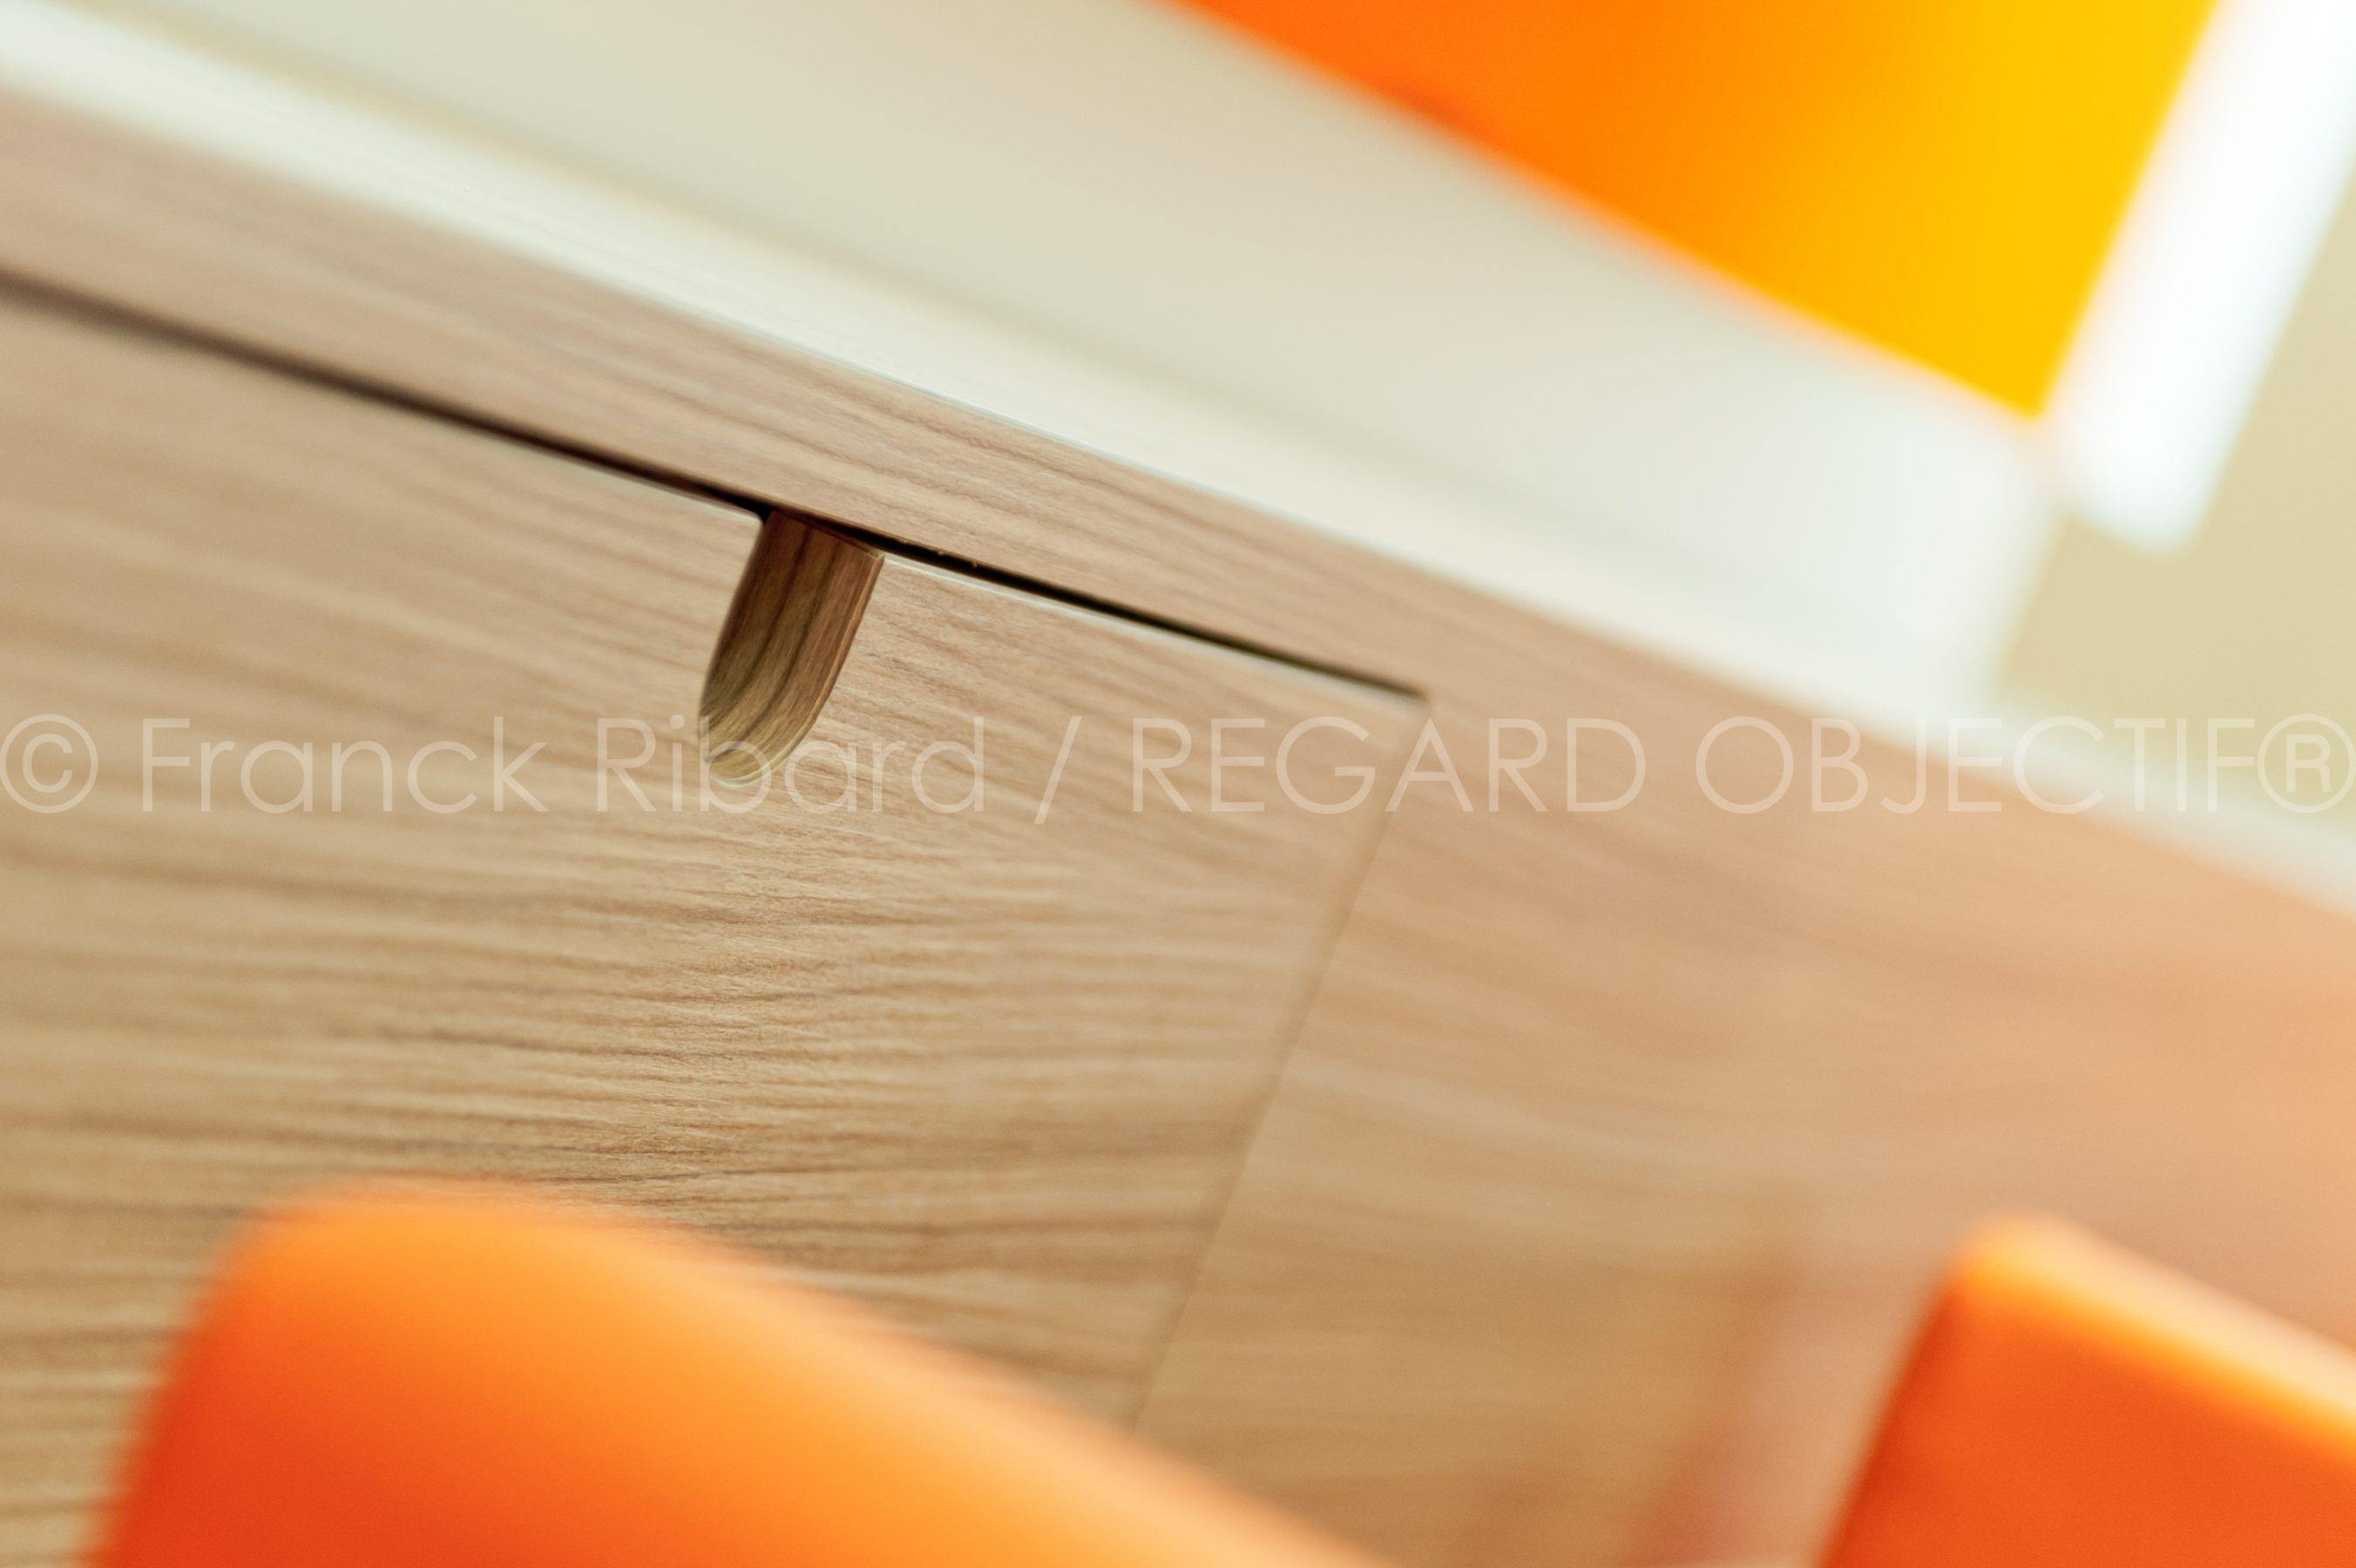 photographie de franck ribard - regard objectif - photographe architecture lyon